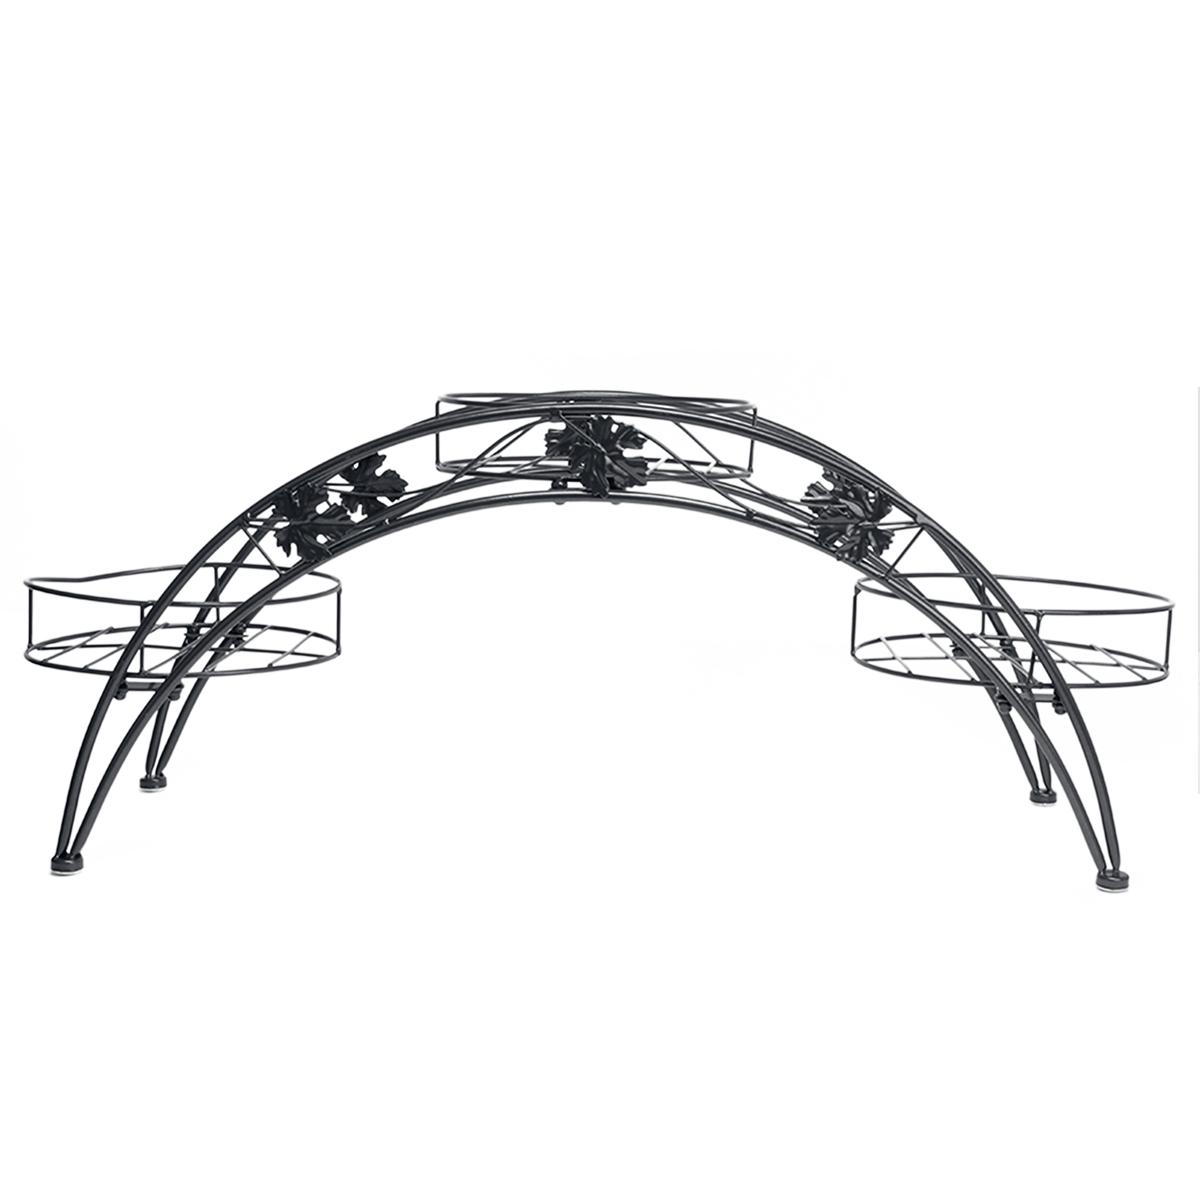 metall blumenst nder blumenhocker pflanzentreppe blumenregal blumentopf regal ebay. Black Bedroom Furniture Sets. Home Design Ideas